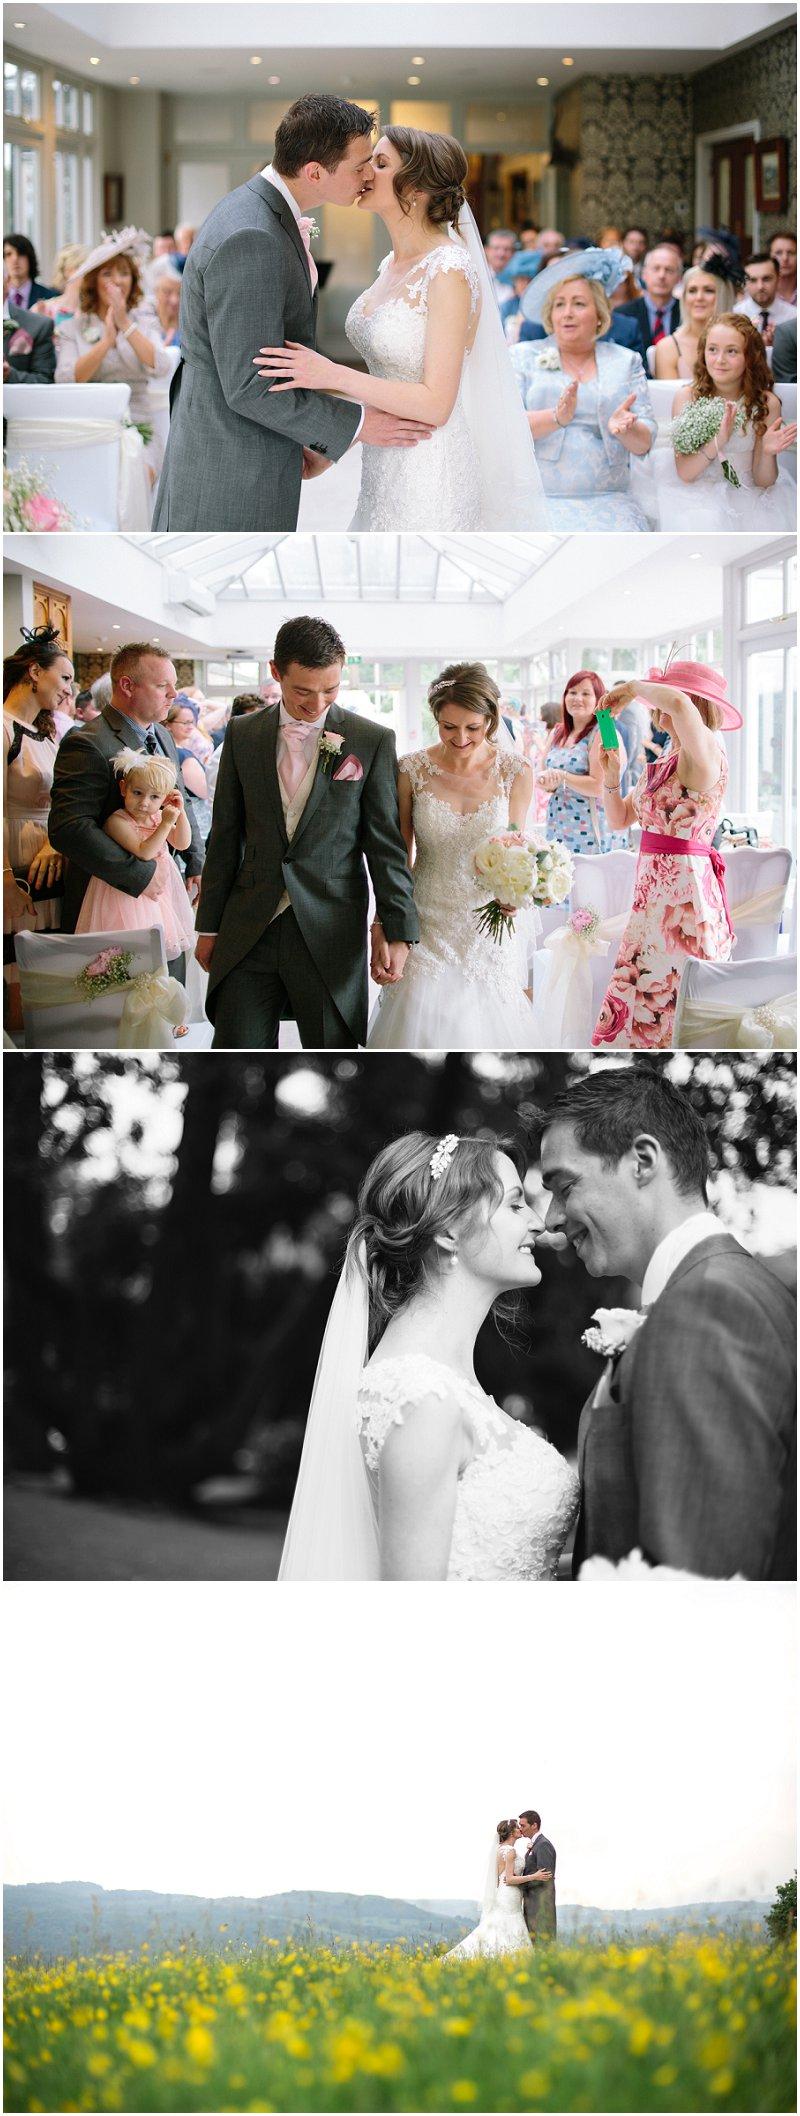 Beautiful Wedding in Broadoaks Country House Hotel | Wedding Photography